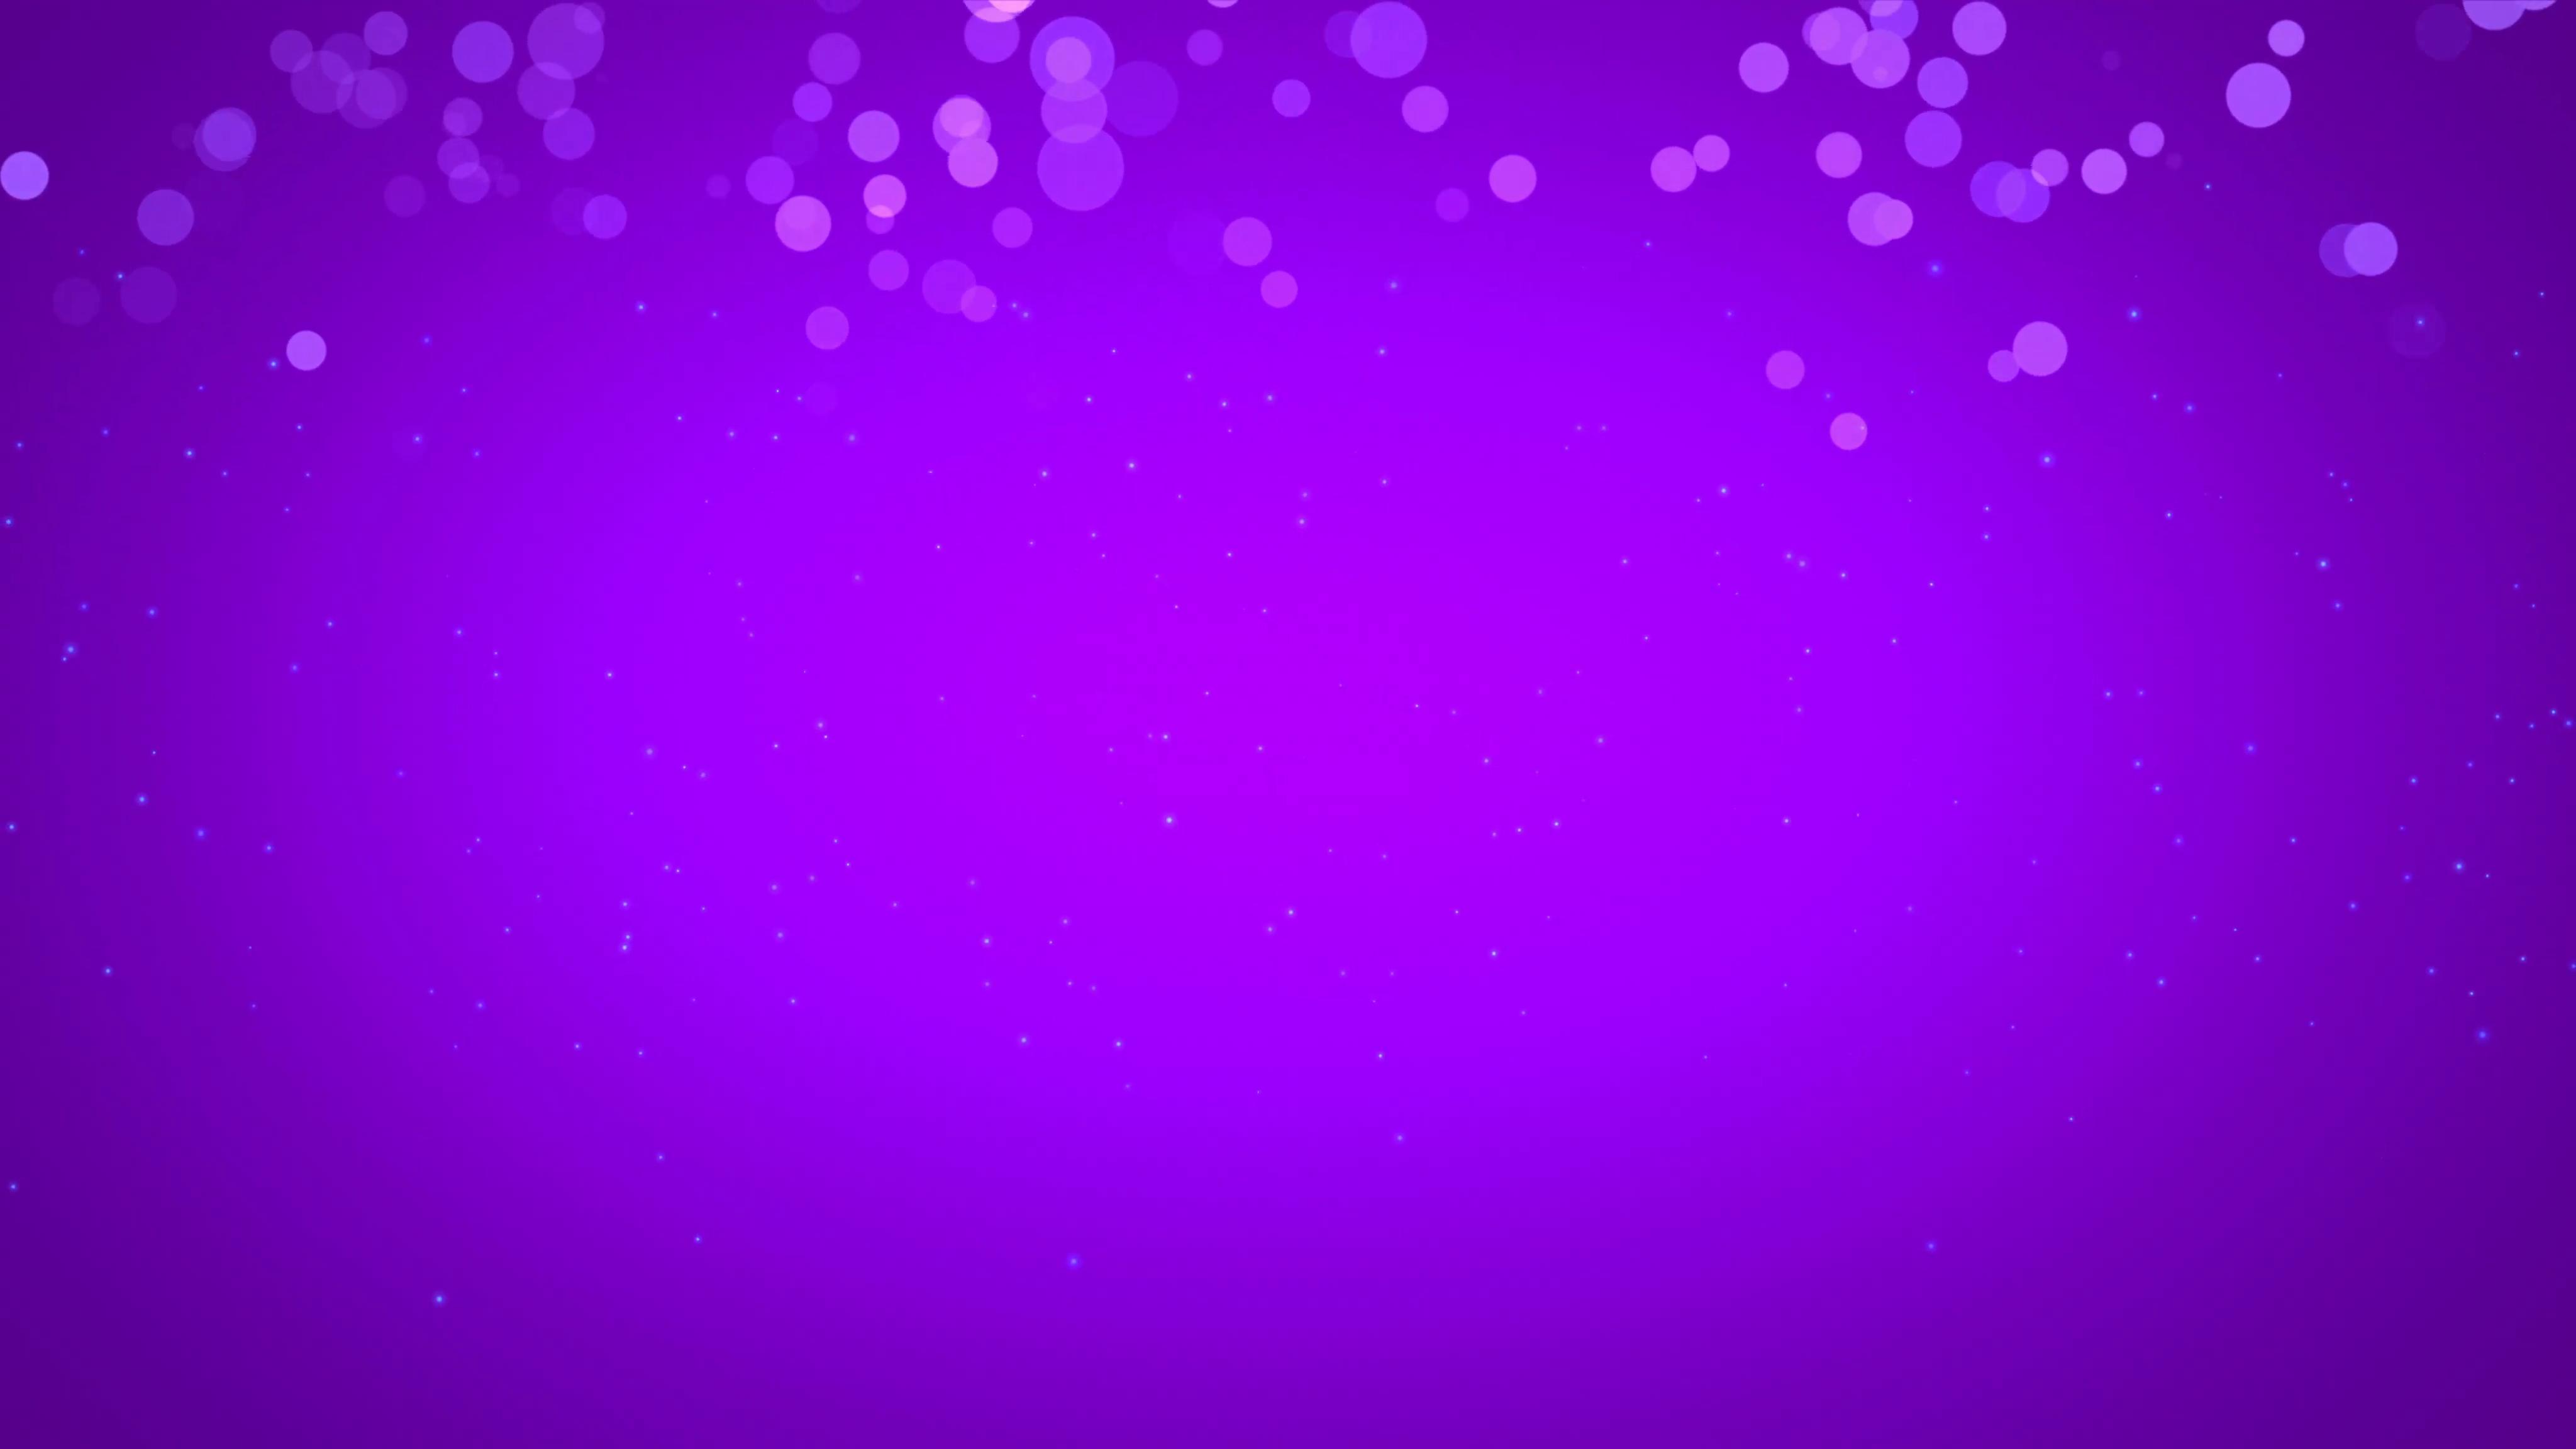 Purple bubble background photo